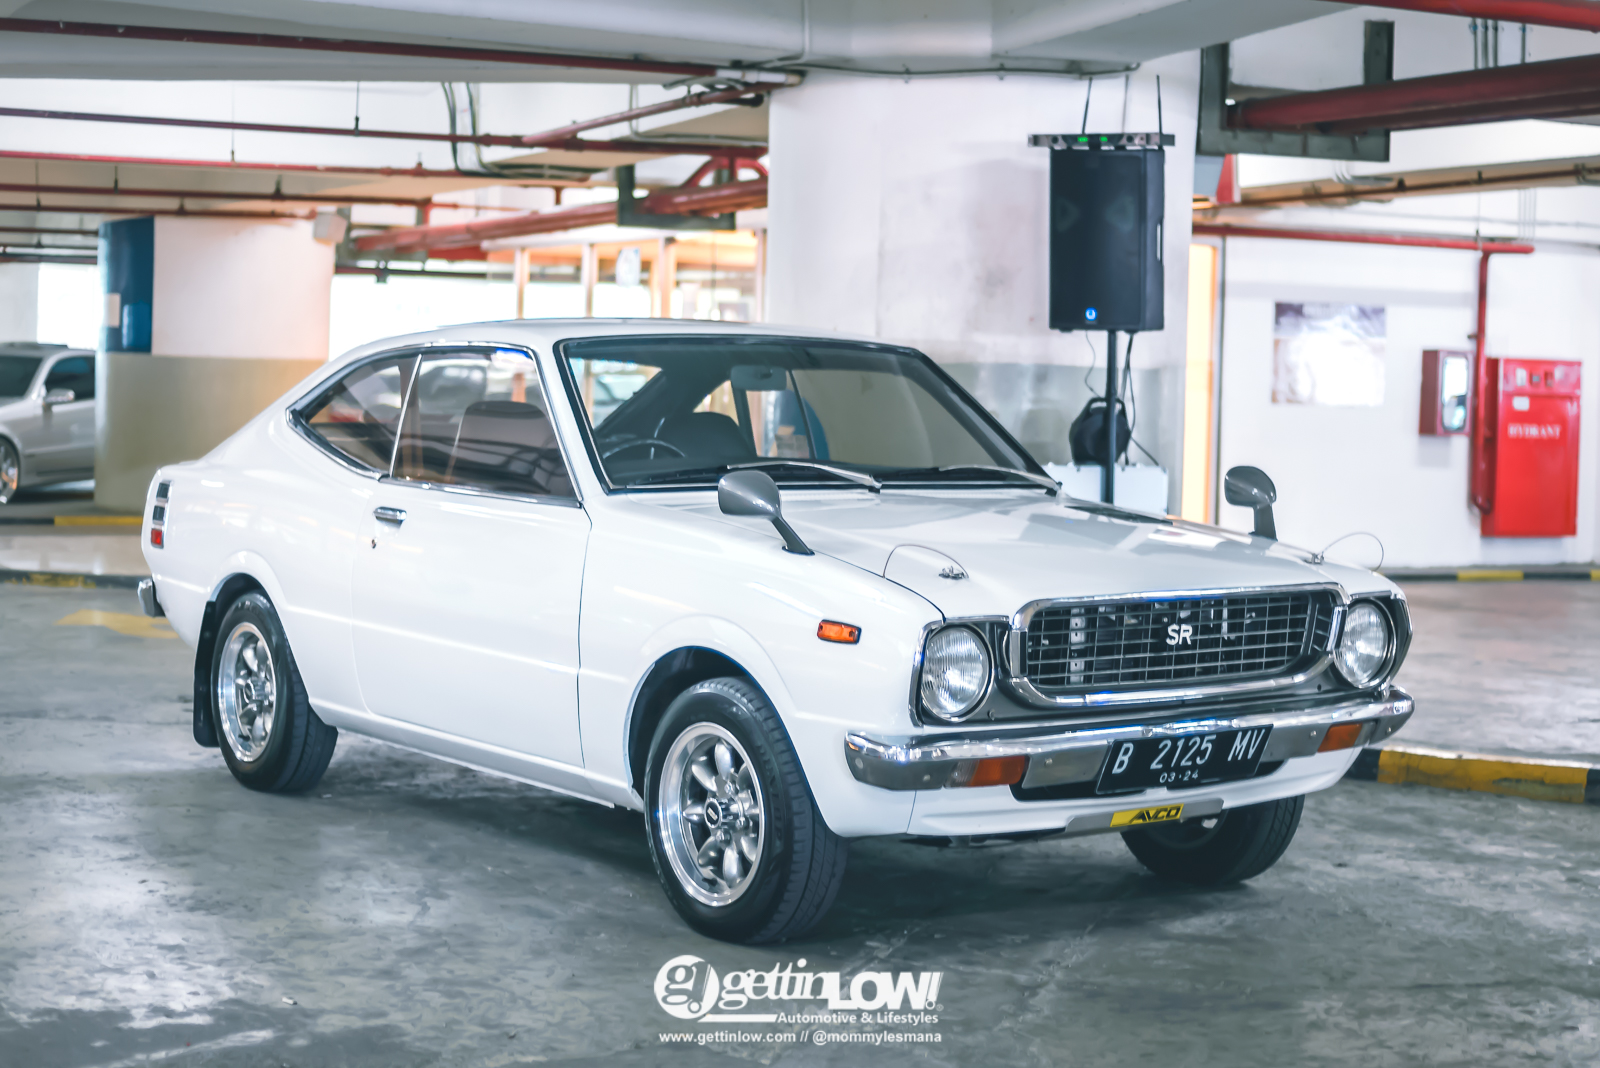 Lowfitment Day: Uya Kuya Toyota Levin